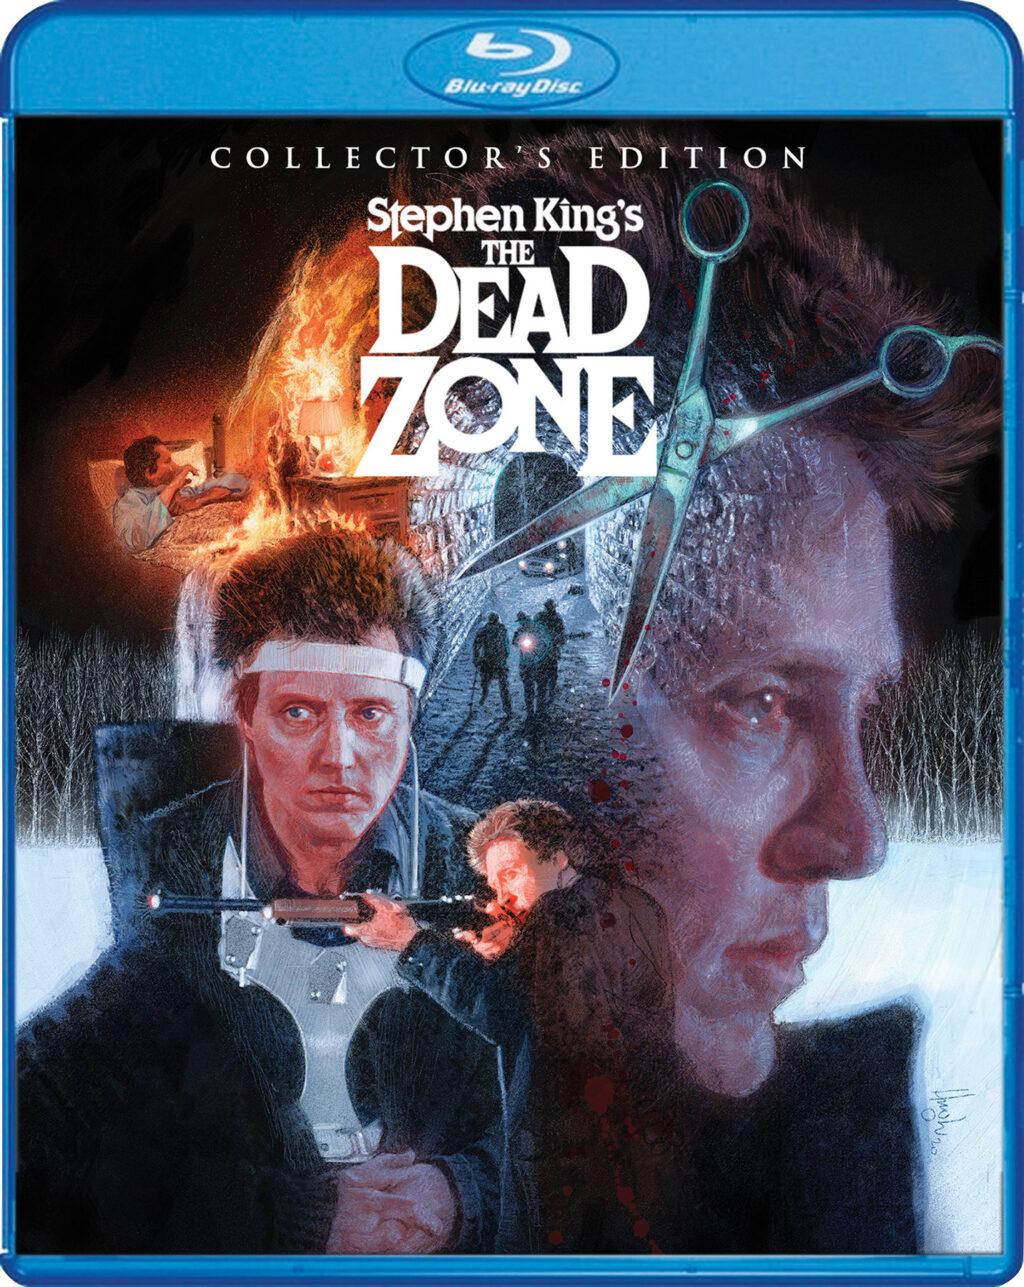 zone morte blu 1024x1287 - Blu-ray review THE DEAD ZONE: Cronenberg and Walken Do Stephen King's Work Justice